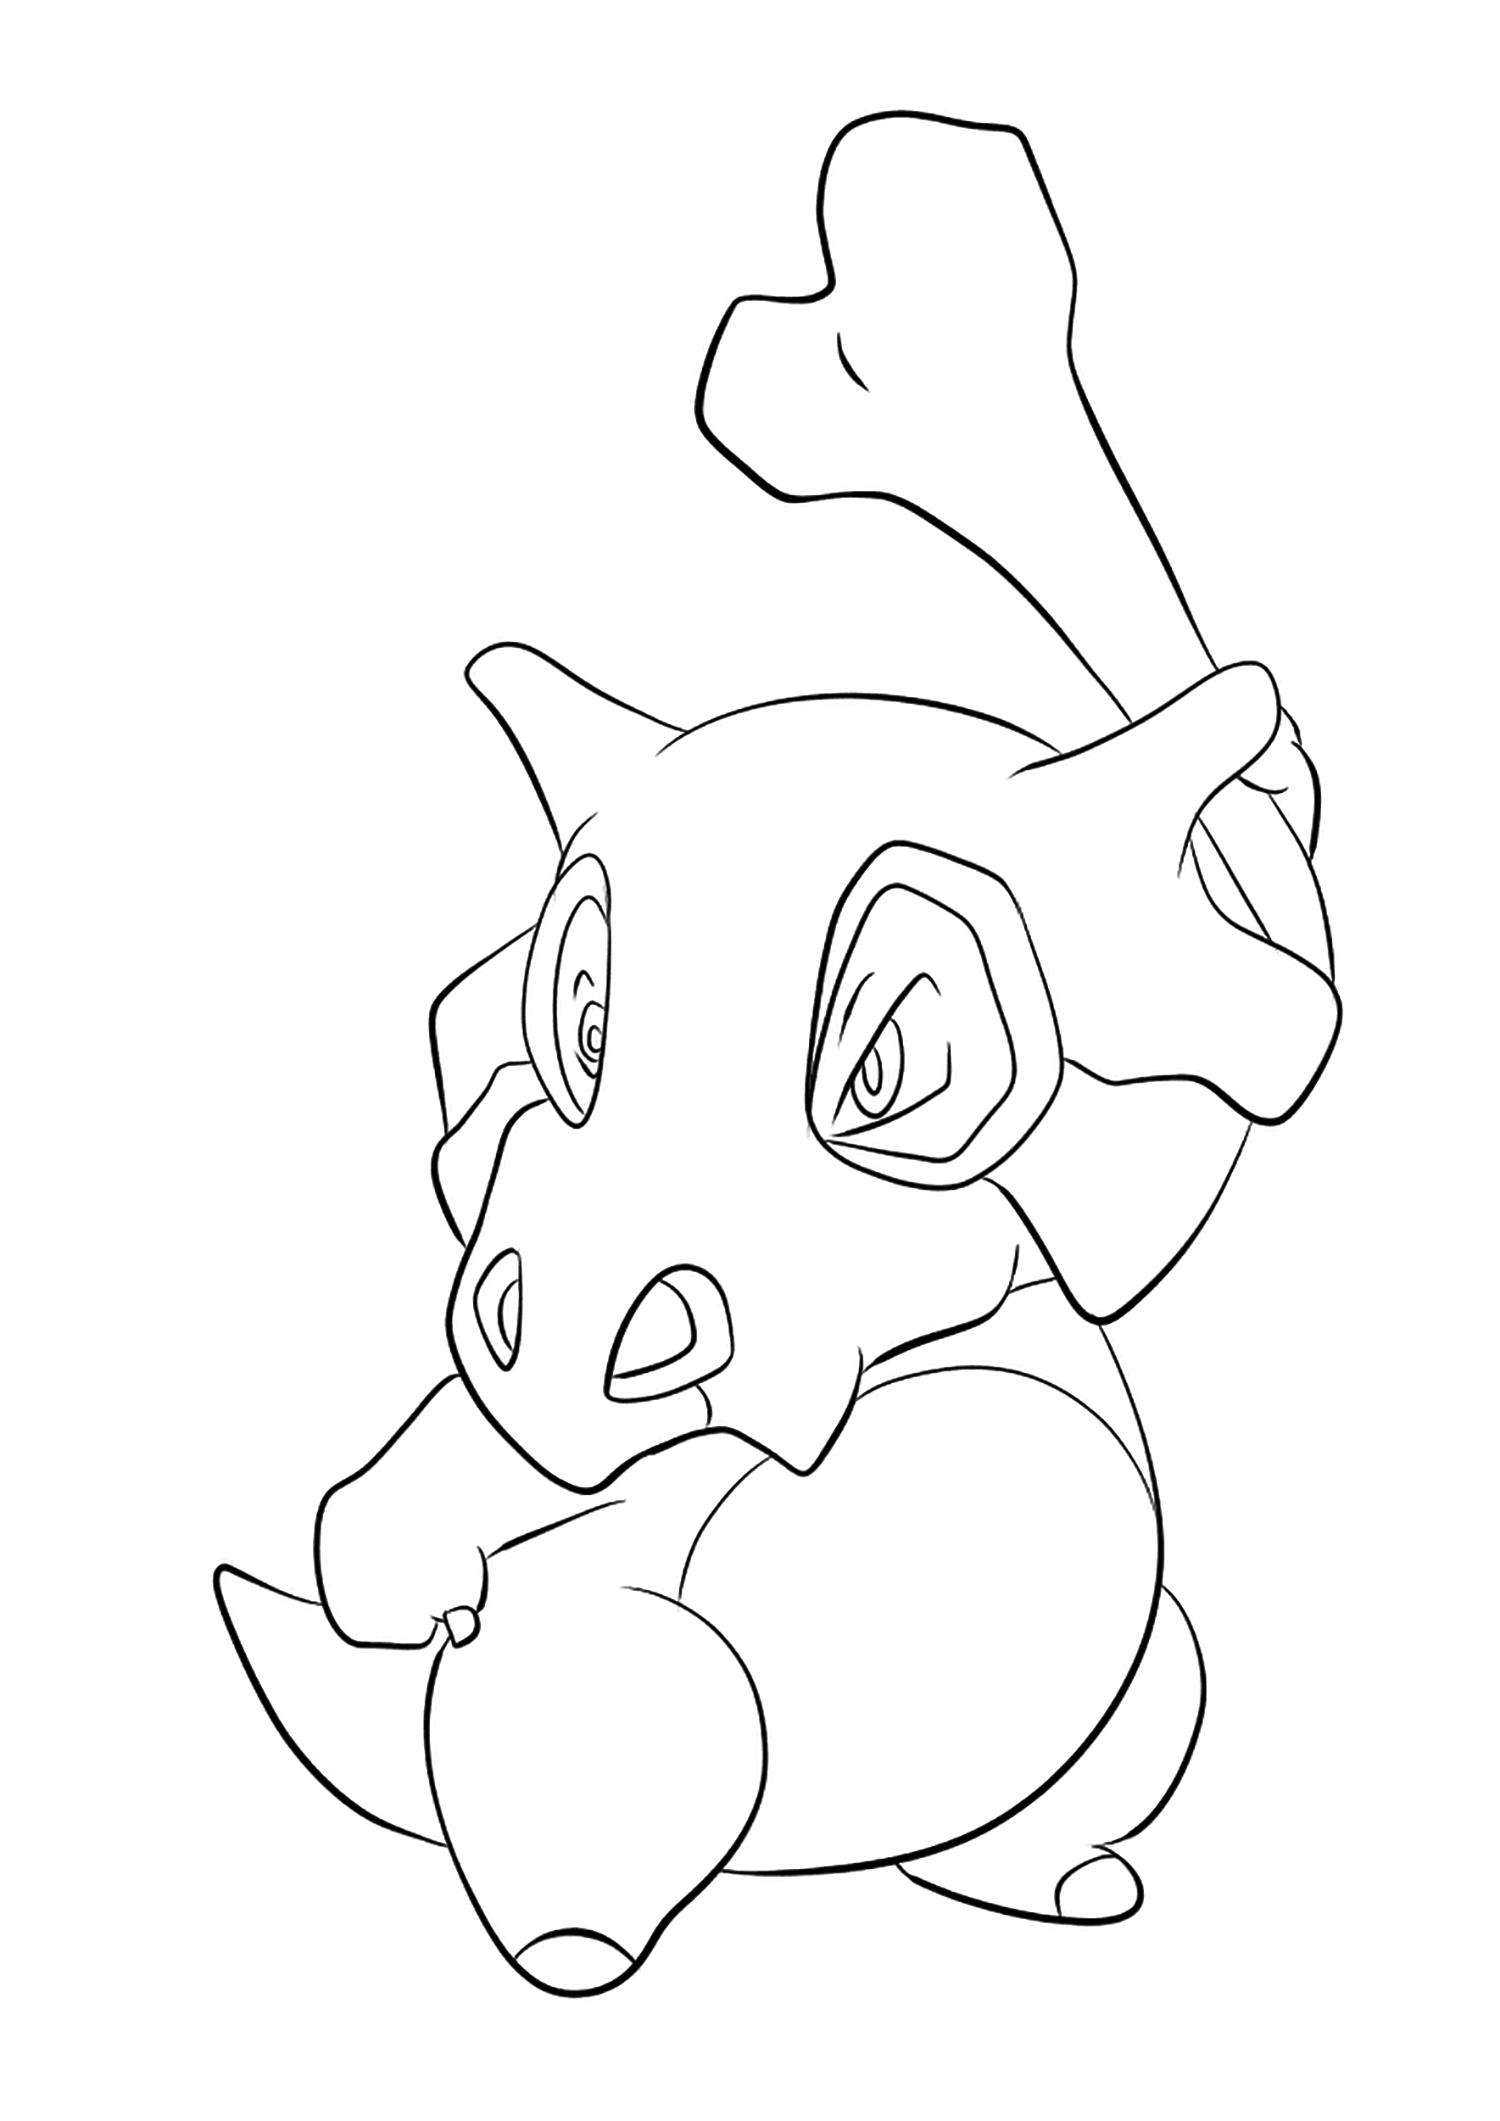 pokemon coloring pics pokemon to color for kids all pokemon coloring pages coloring pics pokemon